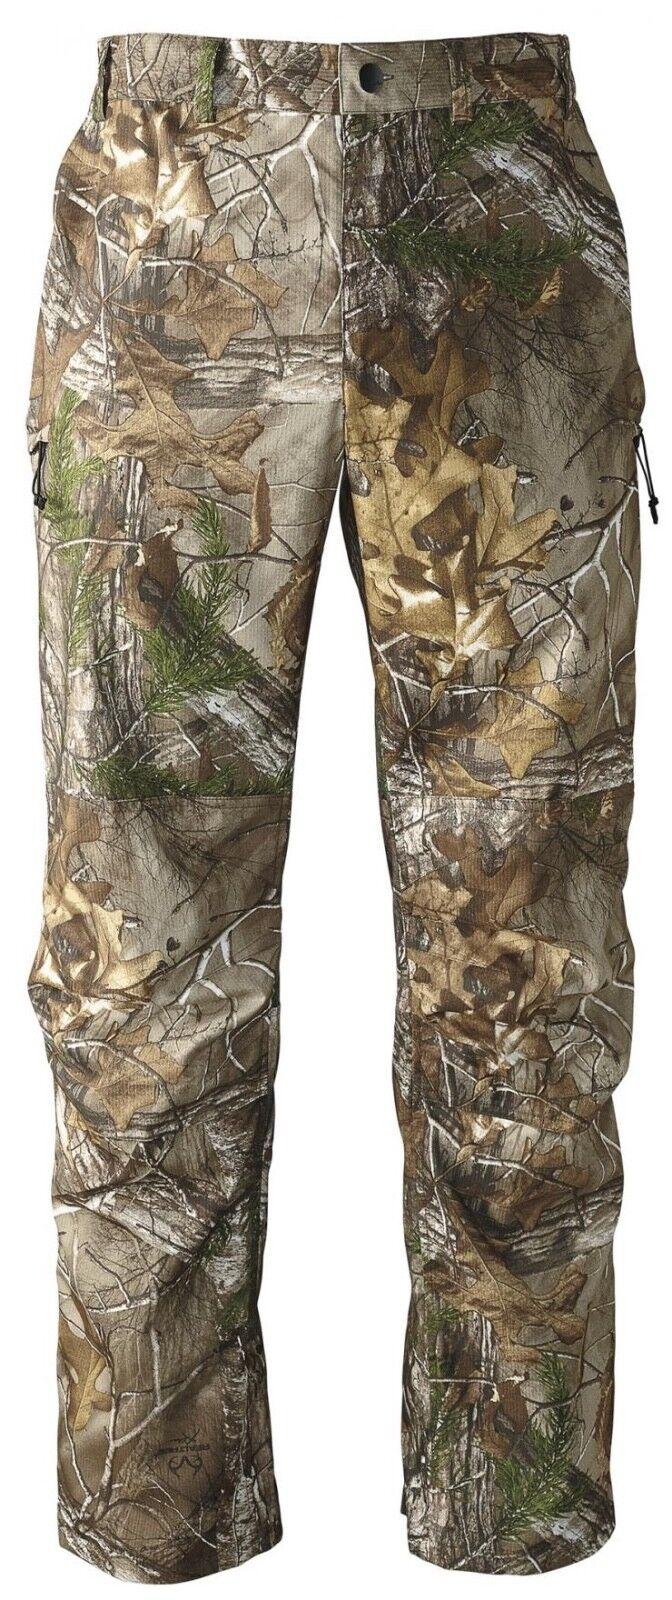 Cabela's Men's Waterproof Windproof Silent Realtree XTRA Ultra Hunting Pants   guaranteed